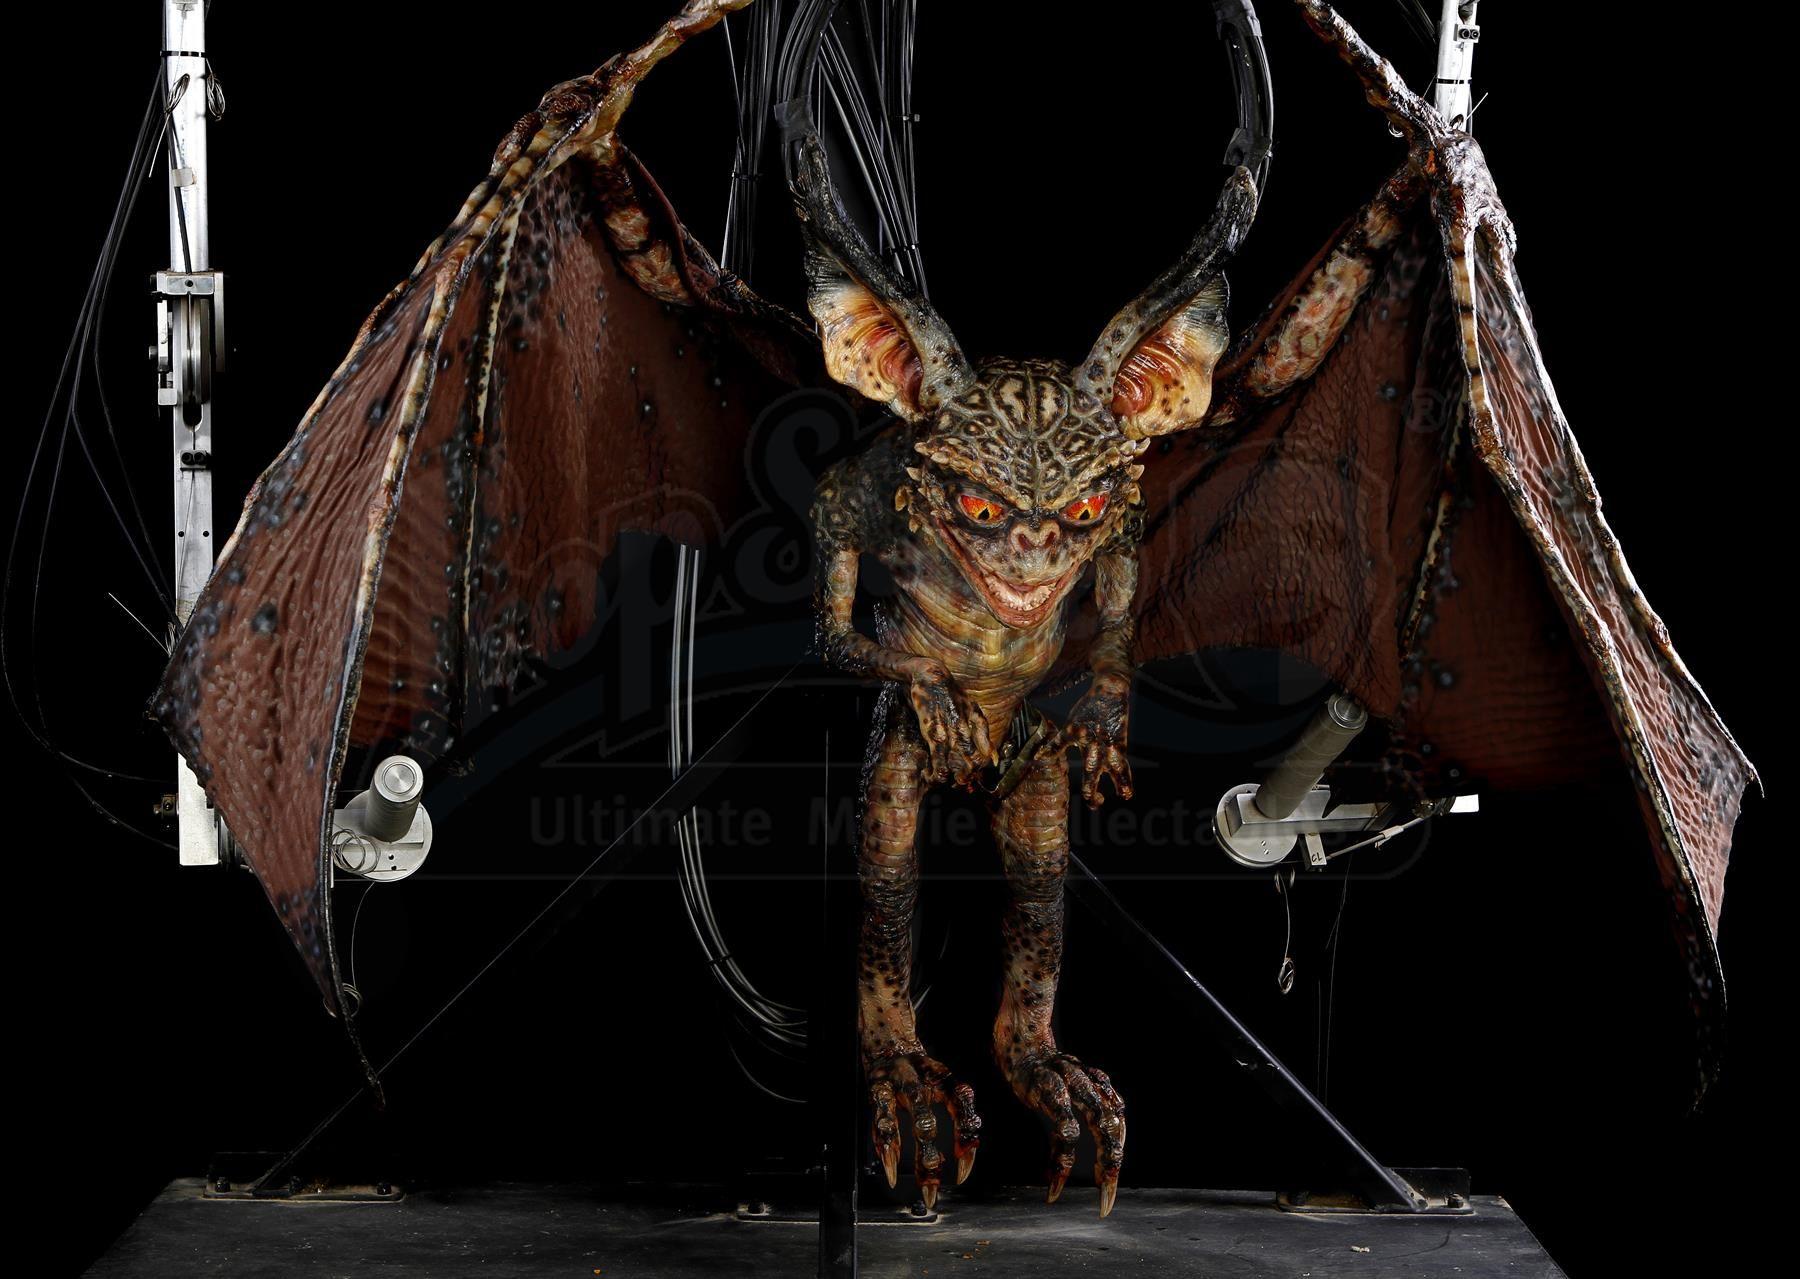 GREMLINS 2: THE NEW BATCH (1990) - Mechanical Bat Gremlin Puppet - Price Estimate: $6000 - $8000